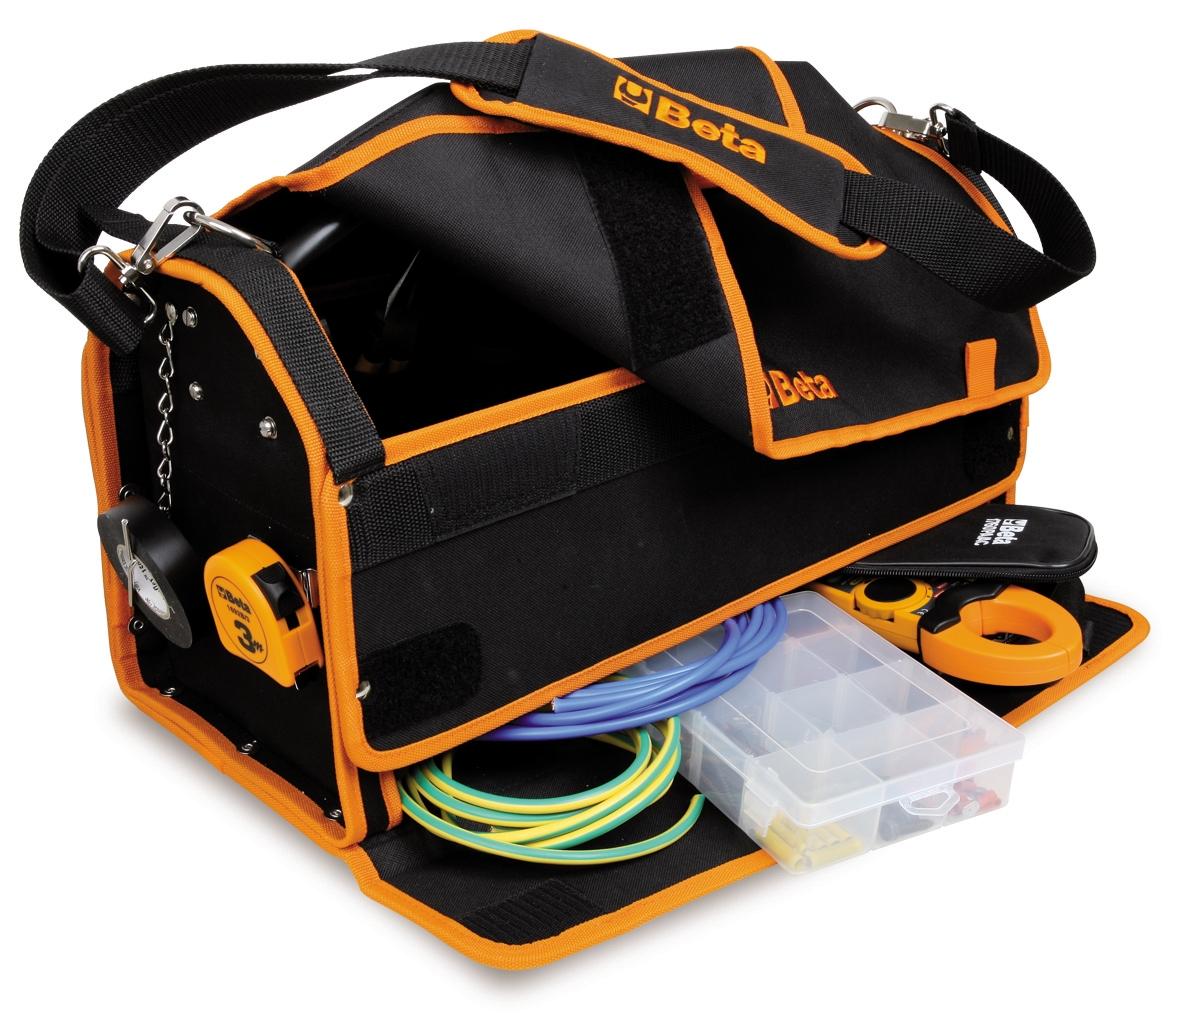 Cestello portautensili beta tools c10s vuoto borsa tessuto - Riparazione finestre vasistas ...